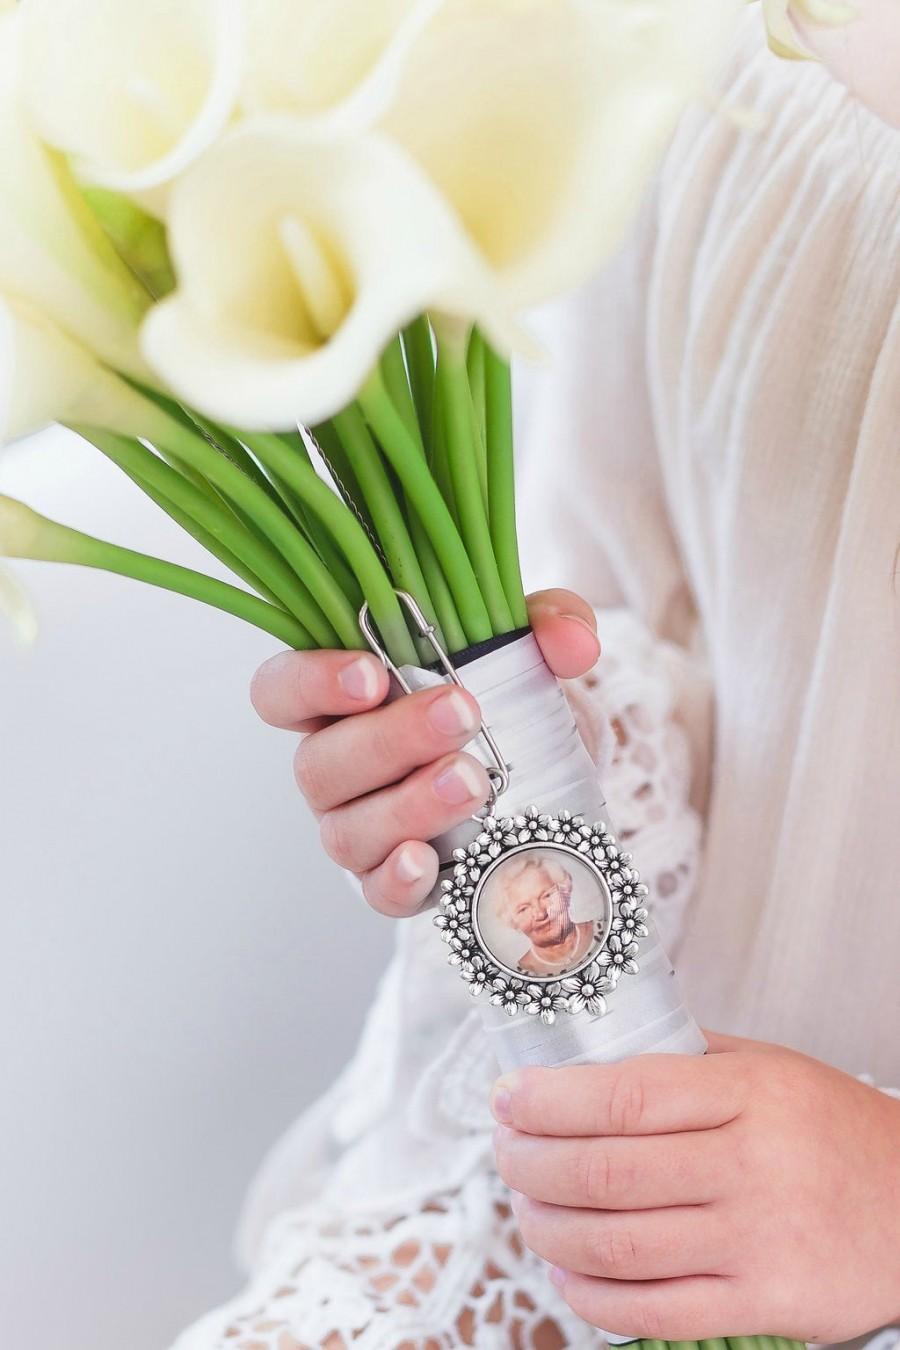 Hochzeit - Bridal Bouquet Photo Charm Bridal Bouquet Charm Bridal Bouquet Memory Charm Bridal Bouquet Charm Dad Bridal Shower Gift Personalized Custom